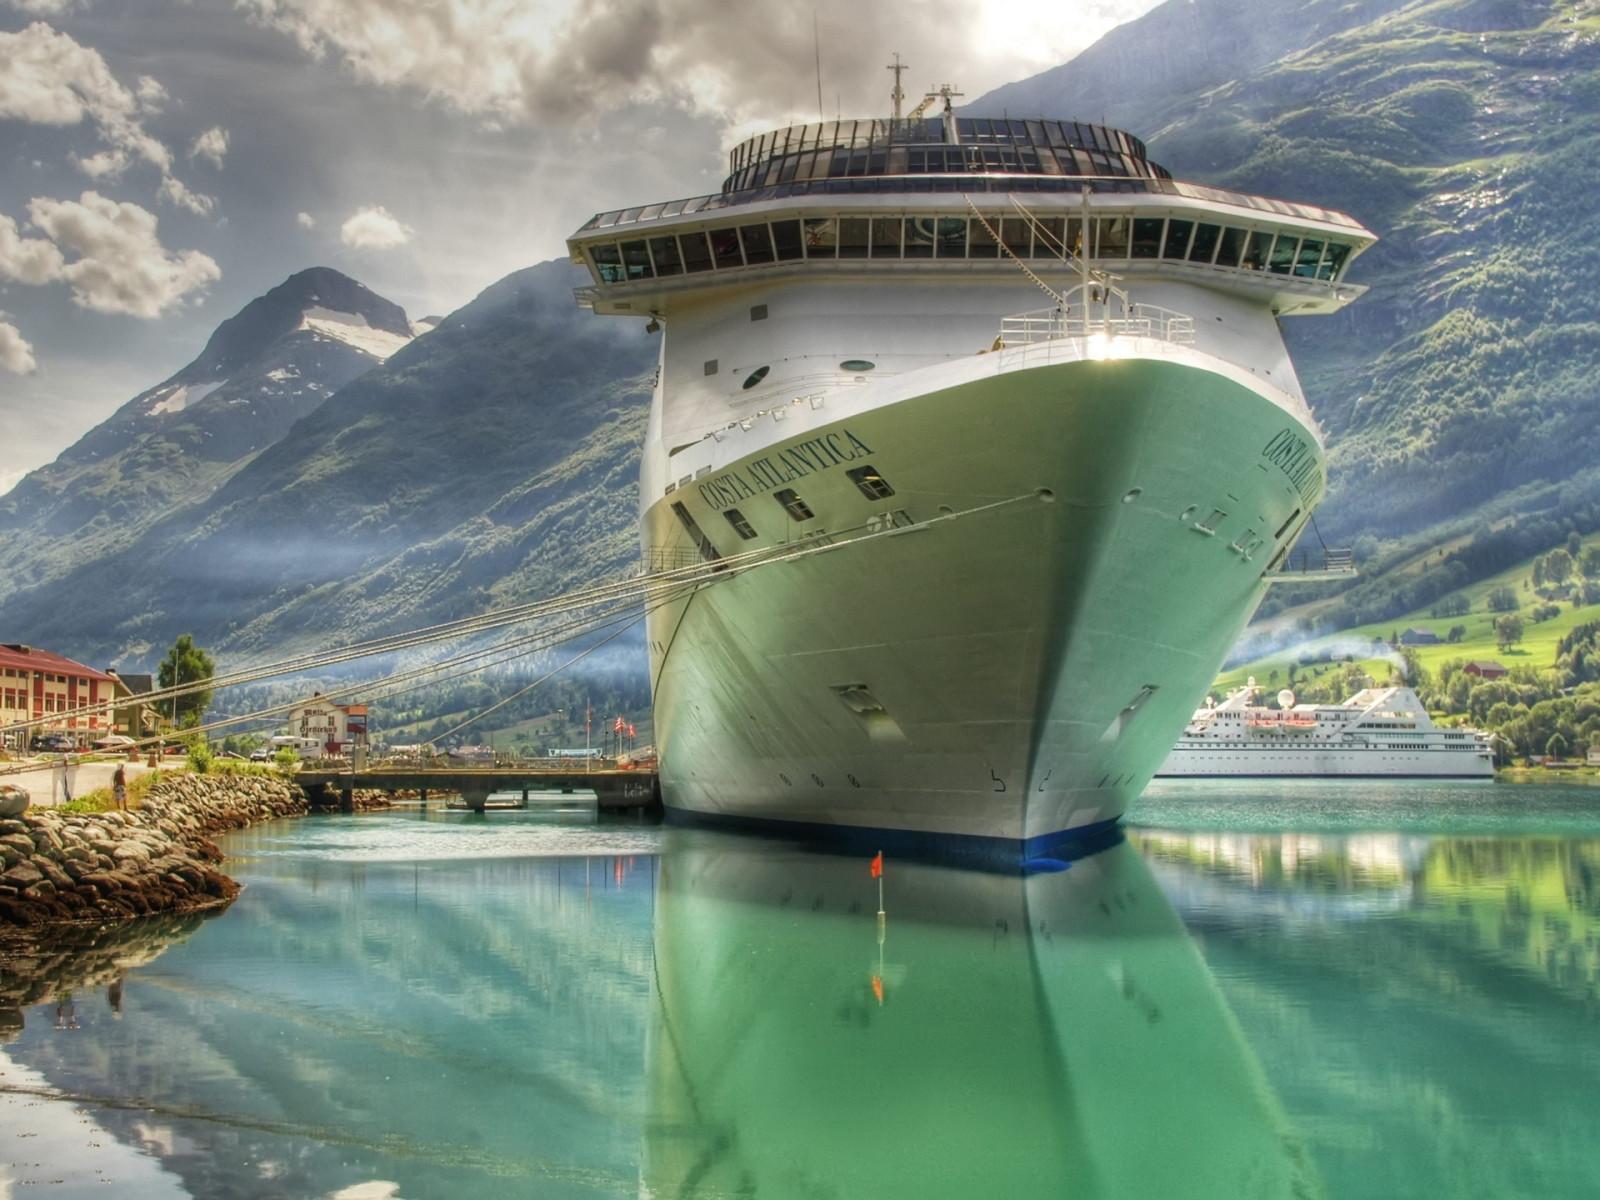 Cruise Ship Hd Wallpapers Wallpaper202